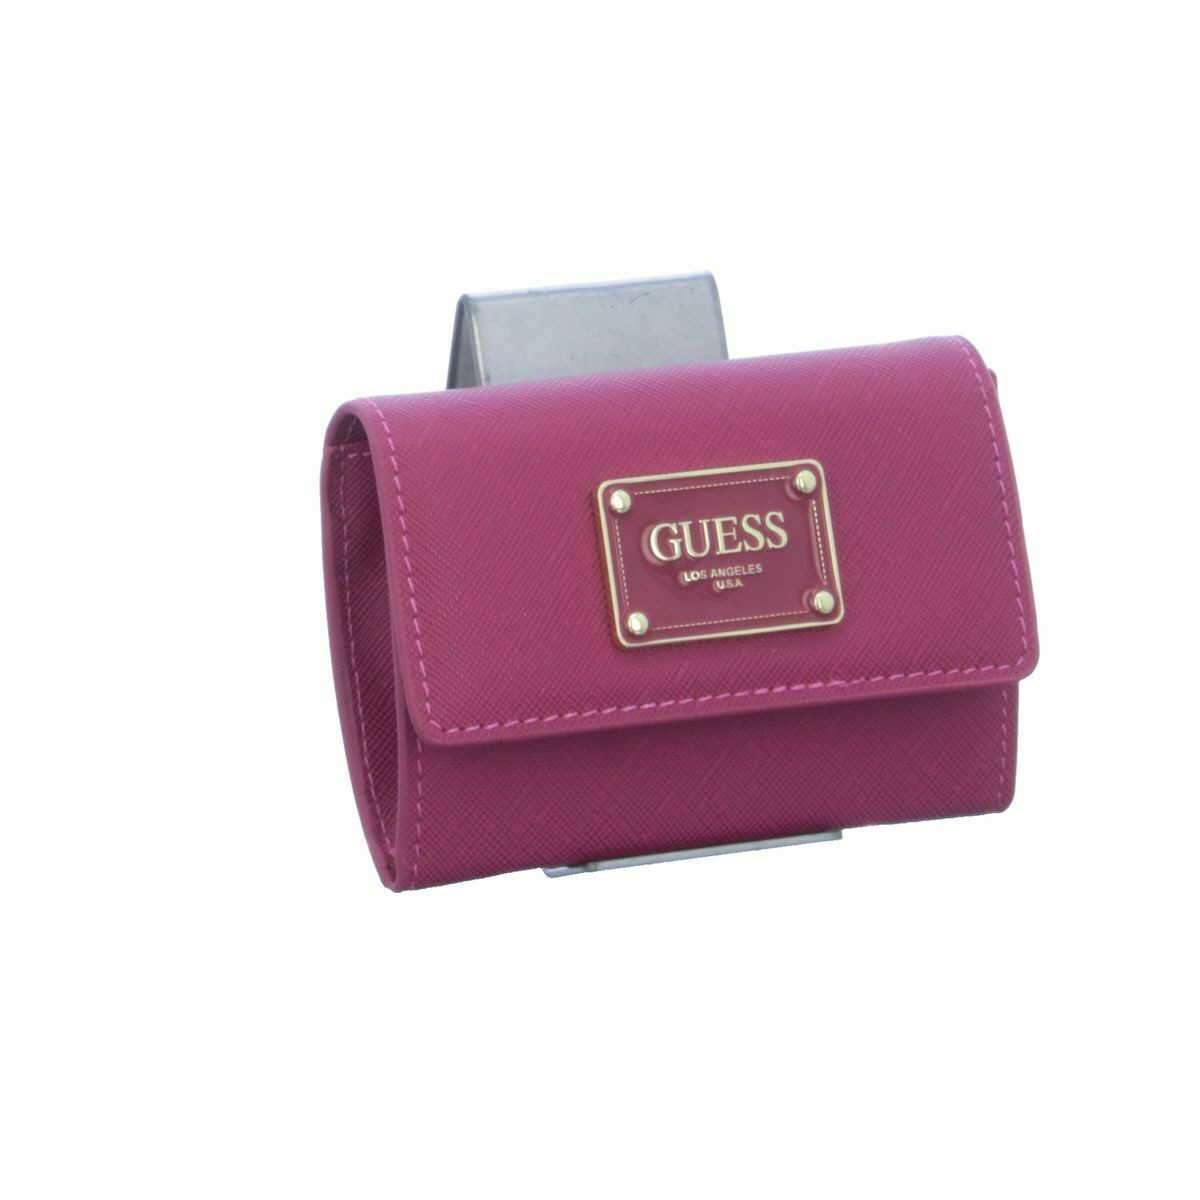 GUESS Geldbörse lila/pink